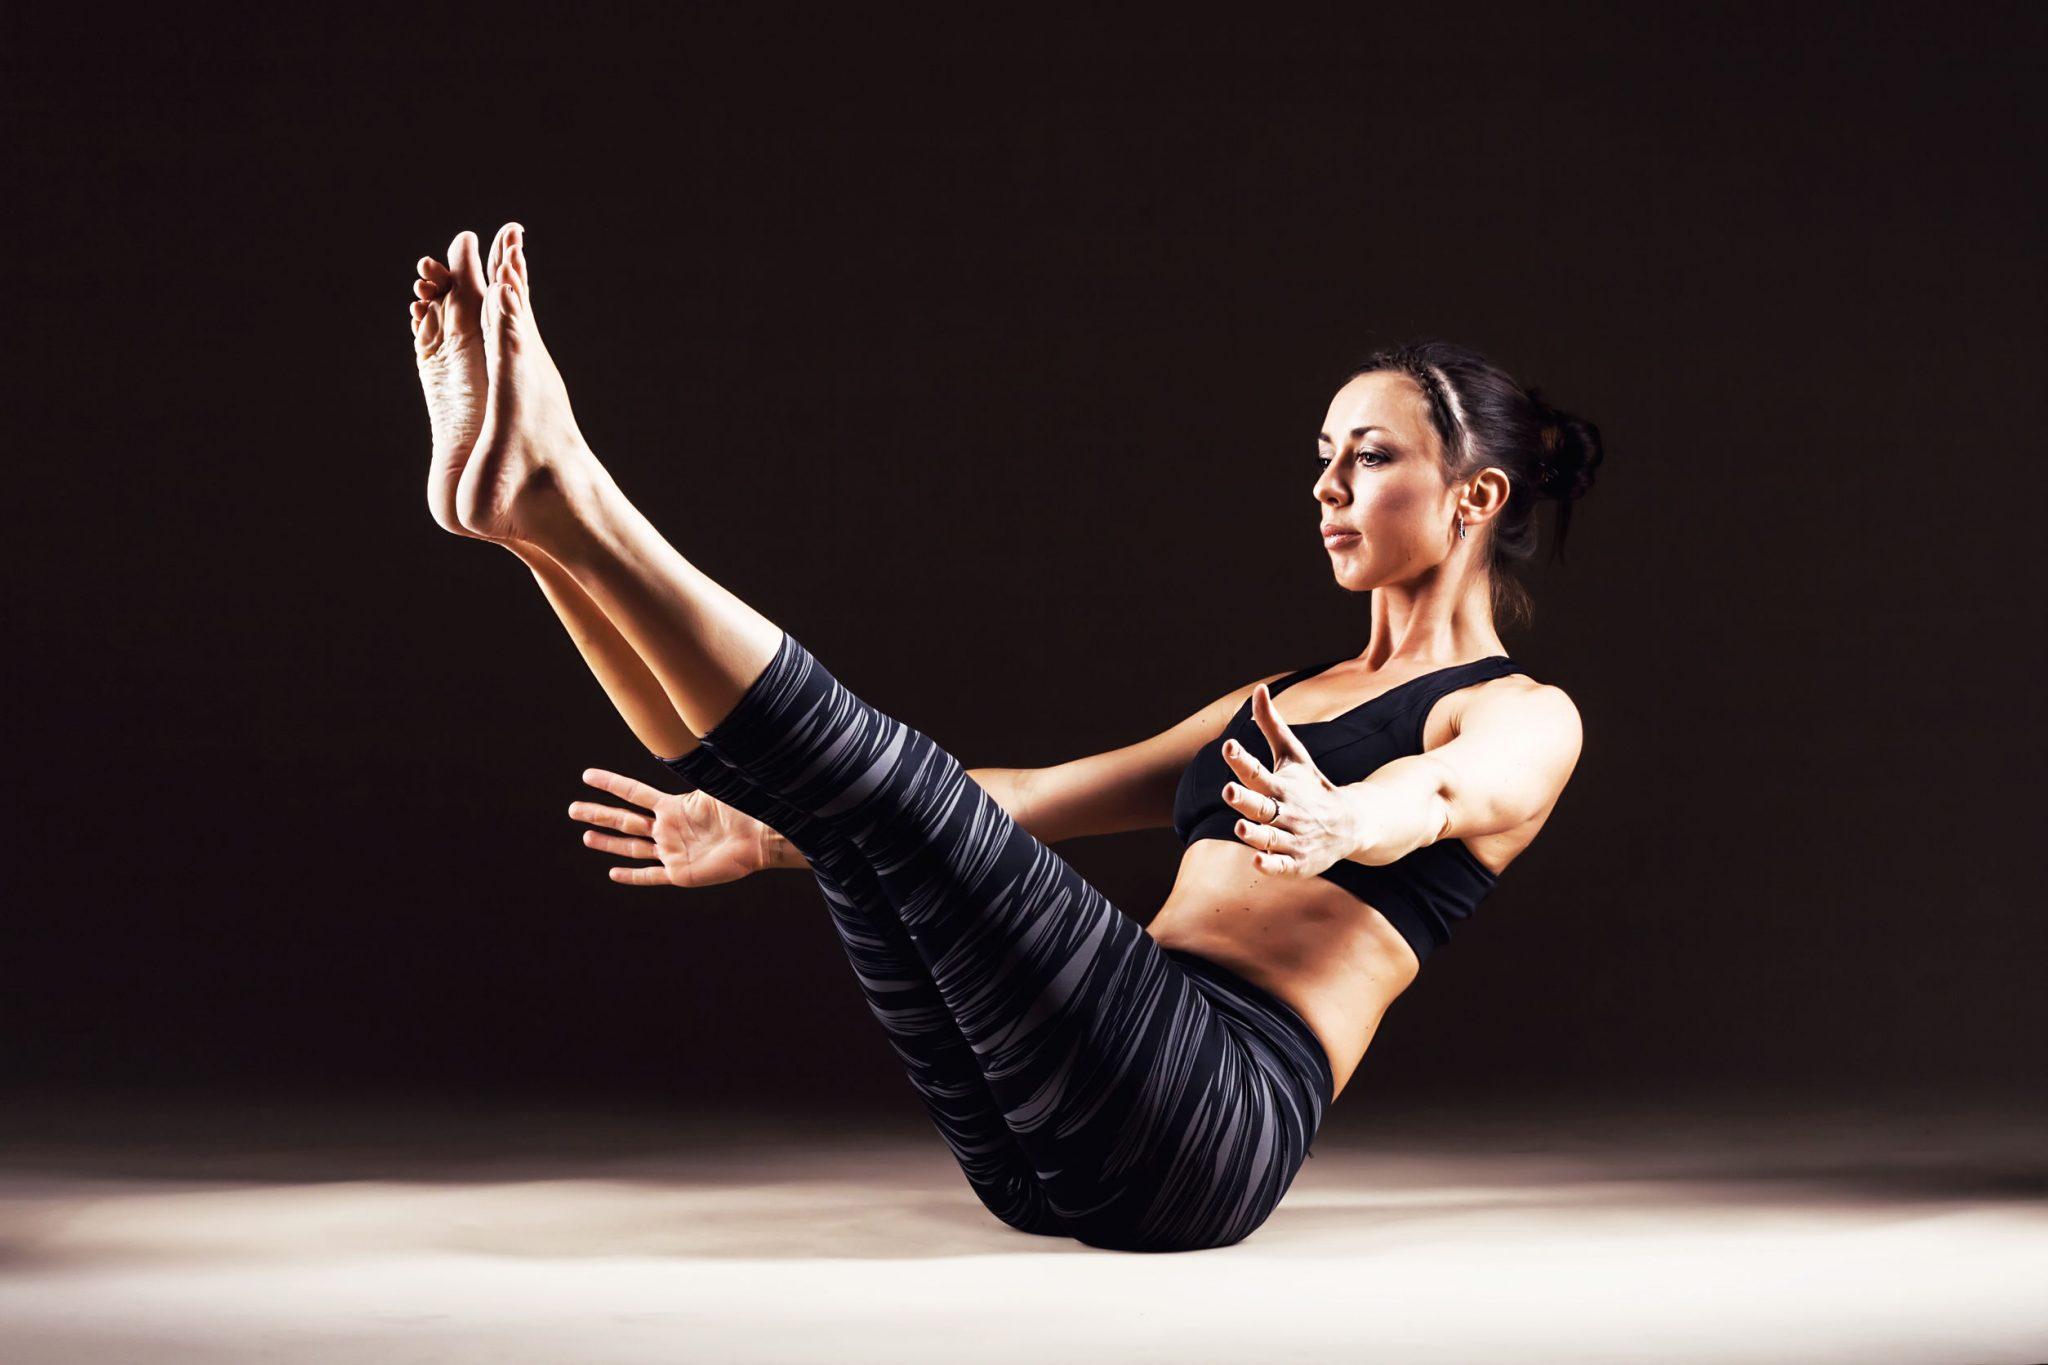 Yoga Pose – The Boat